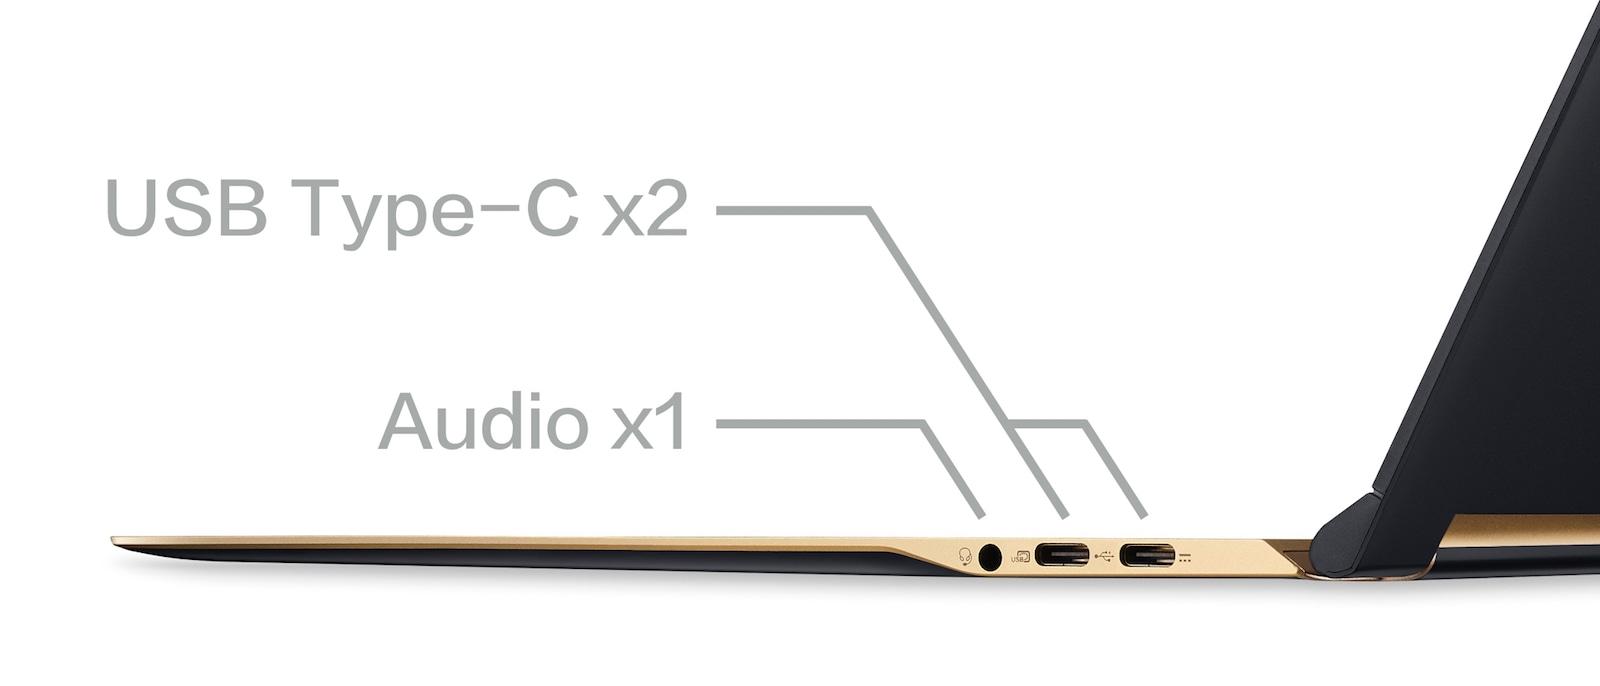 Acer Swift 7 拡張端子